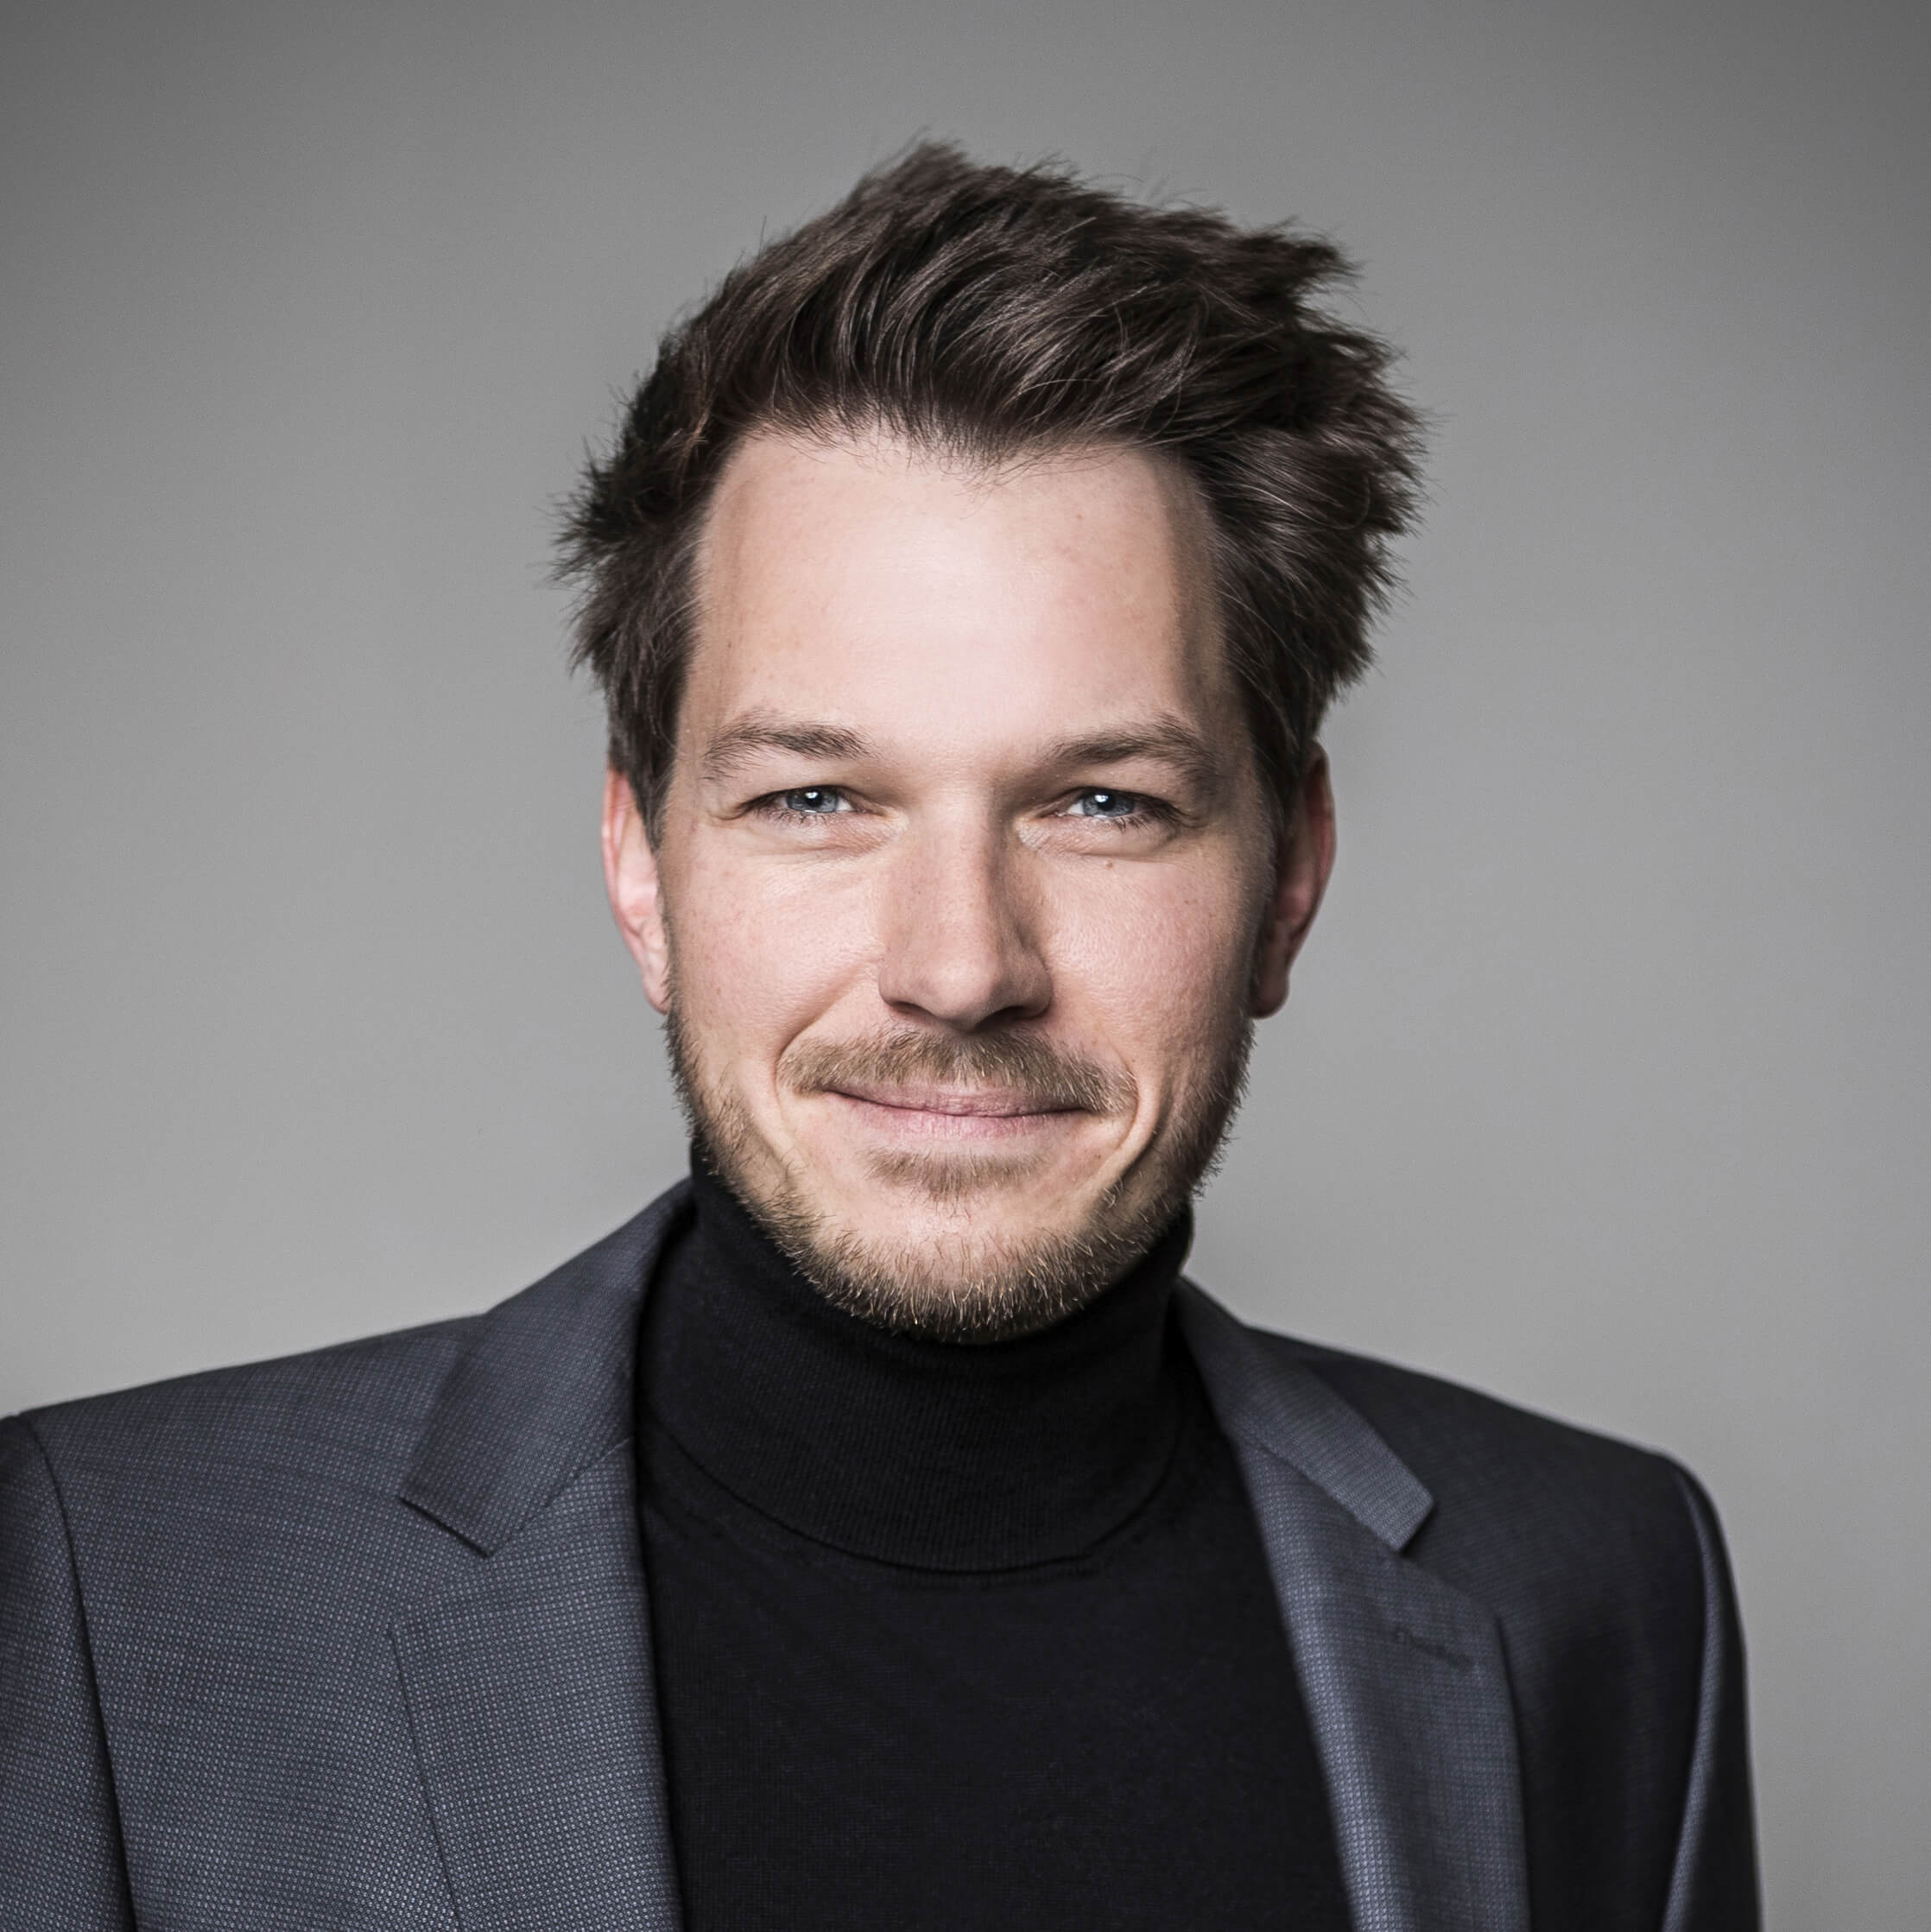 ChristianBiener